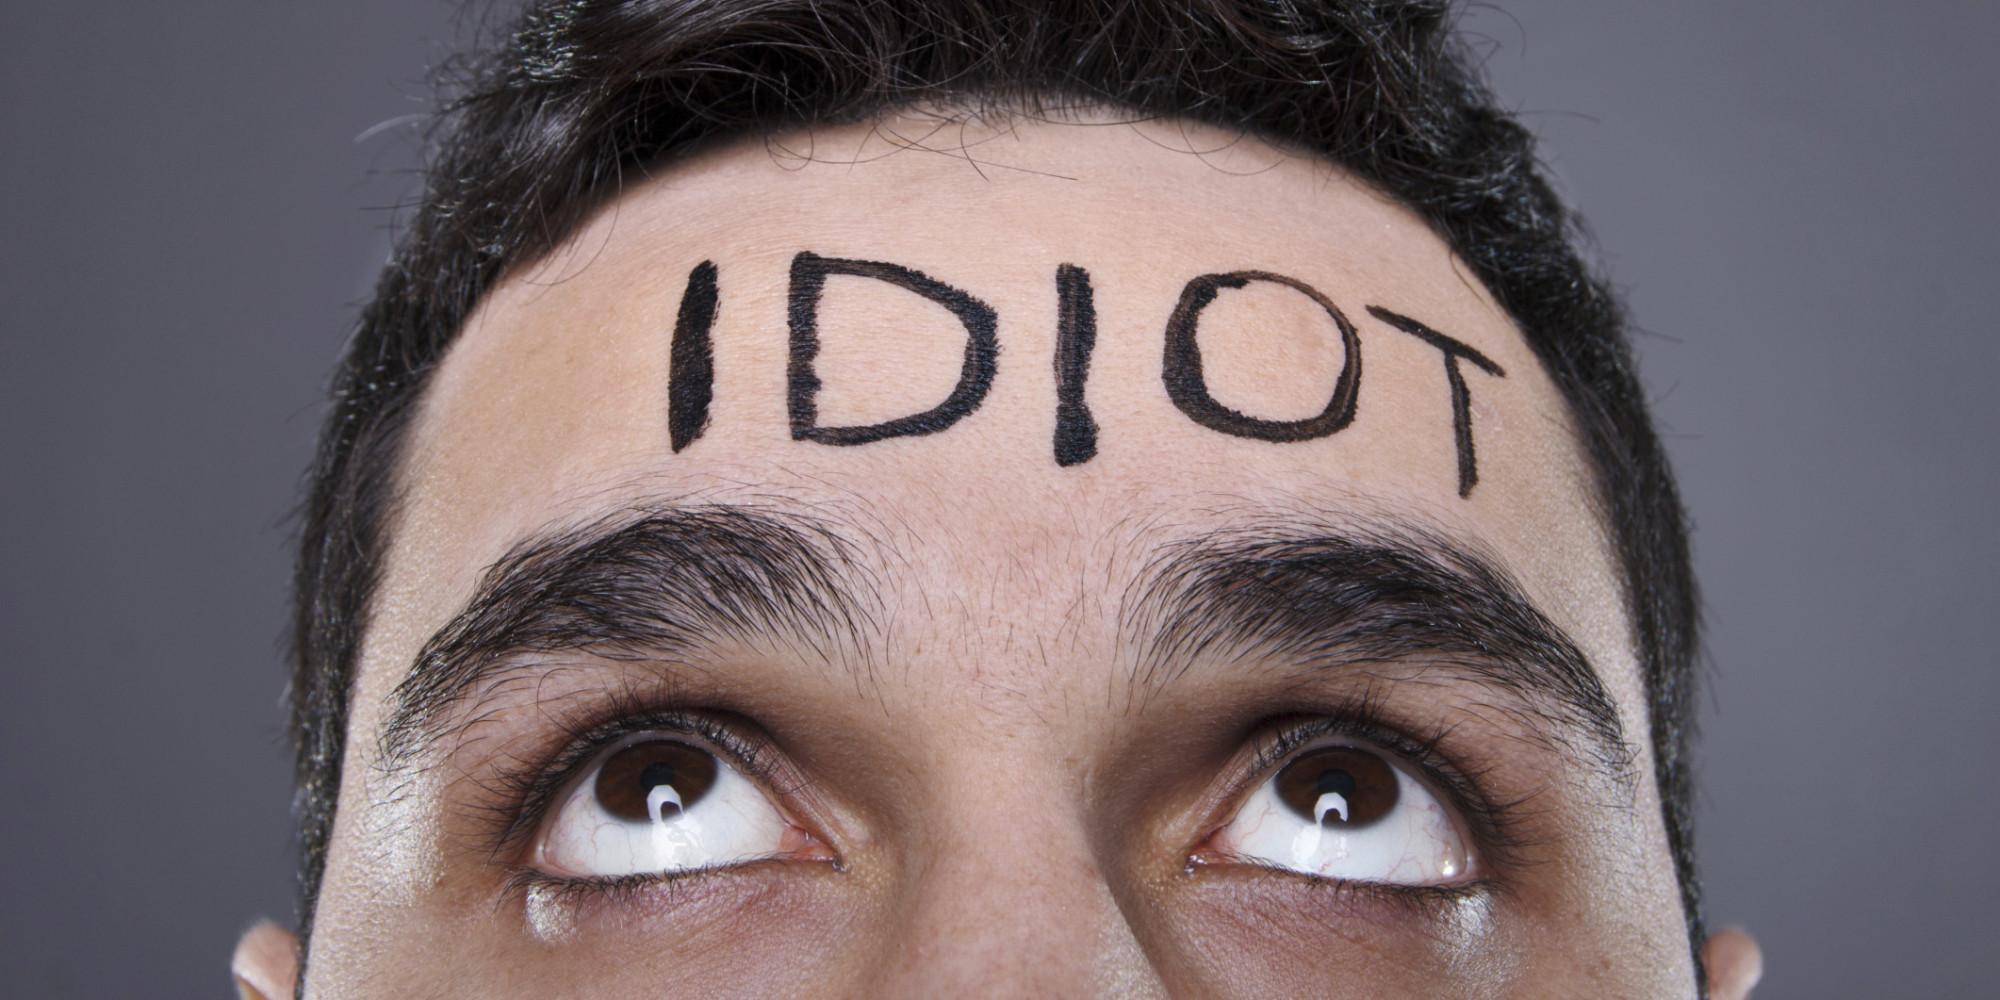 idiotentest teste dich